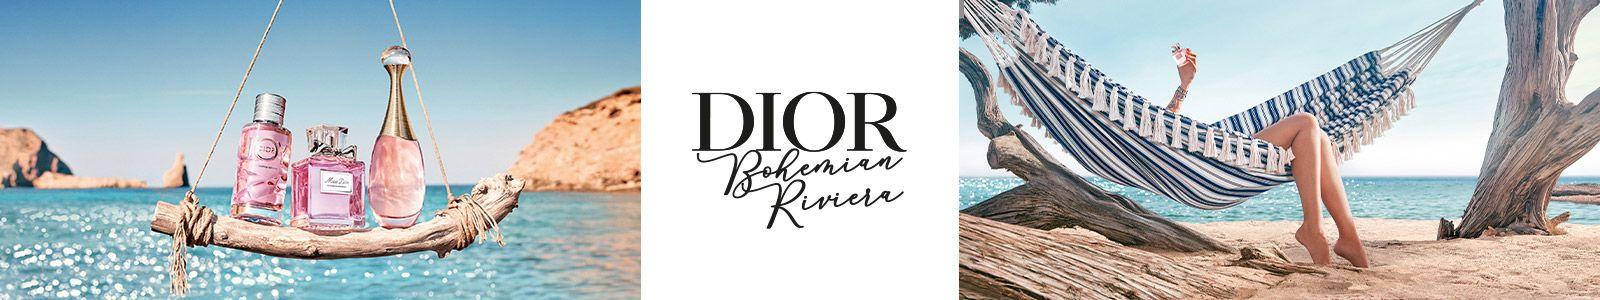 Dior, Bohemian Riviera